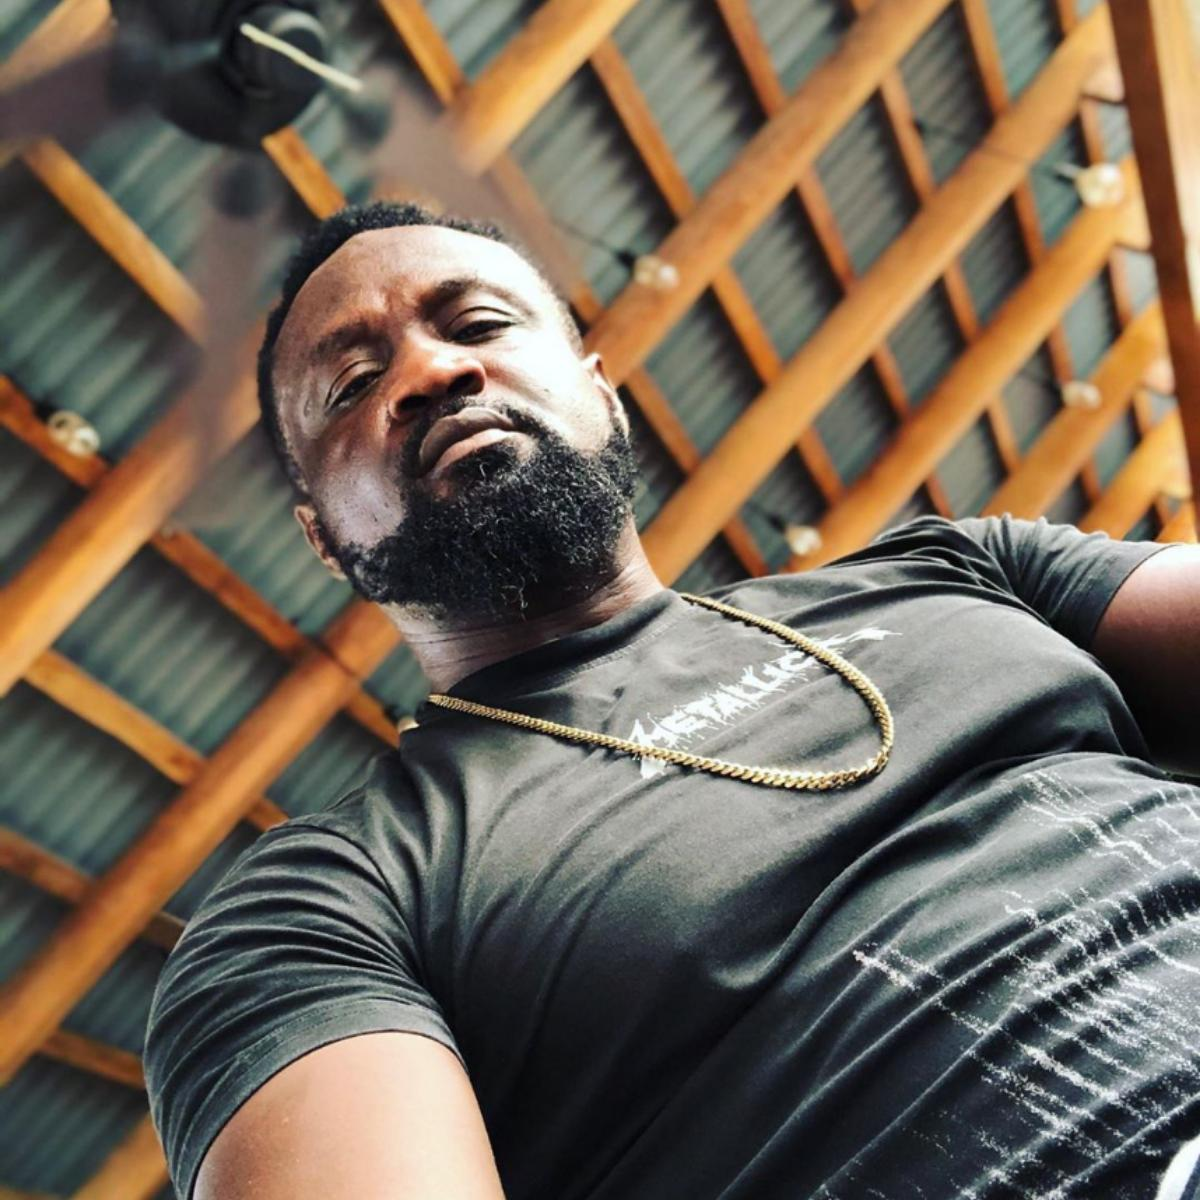 Jude Okoye Wishes Himself Happy Birthday